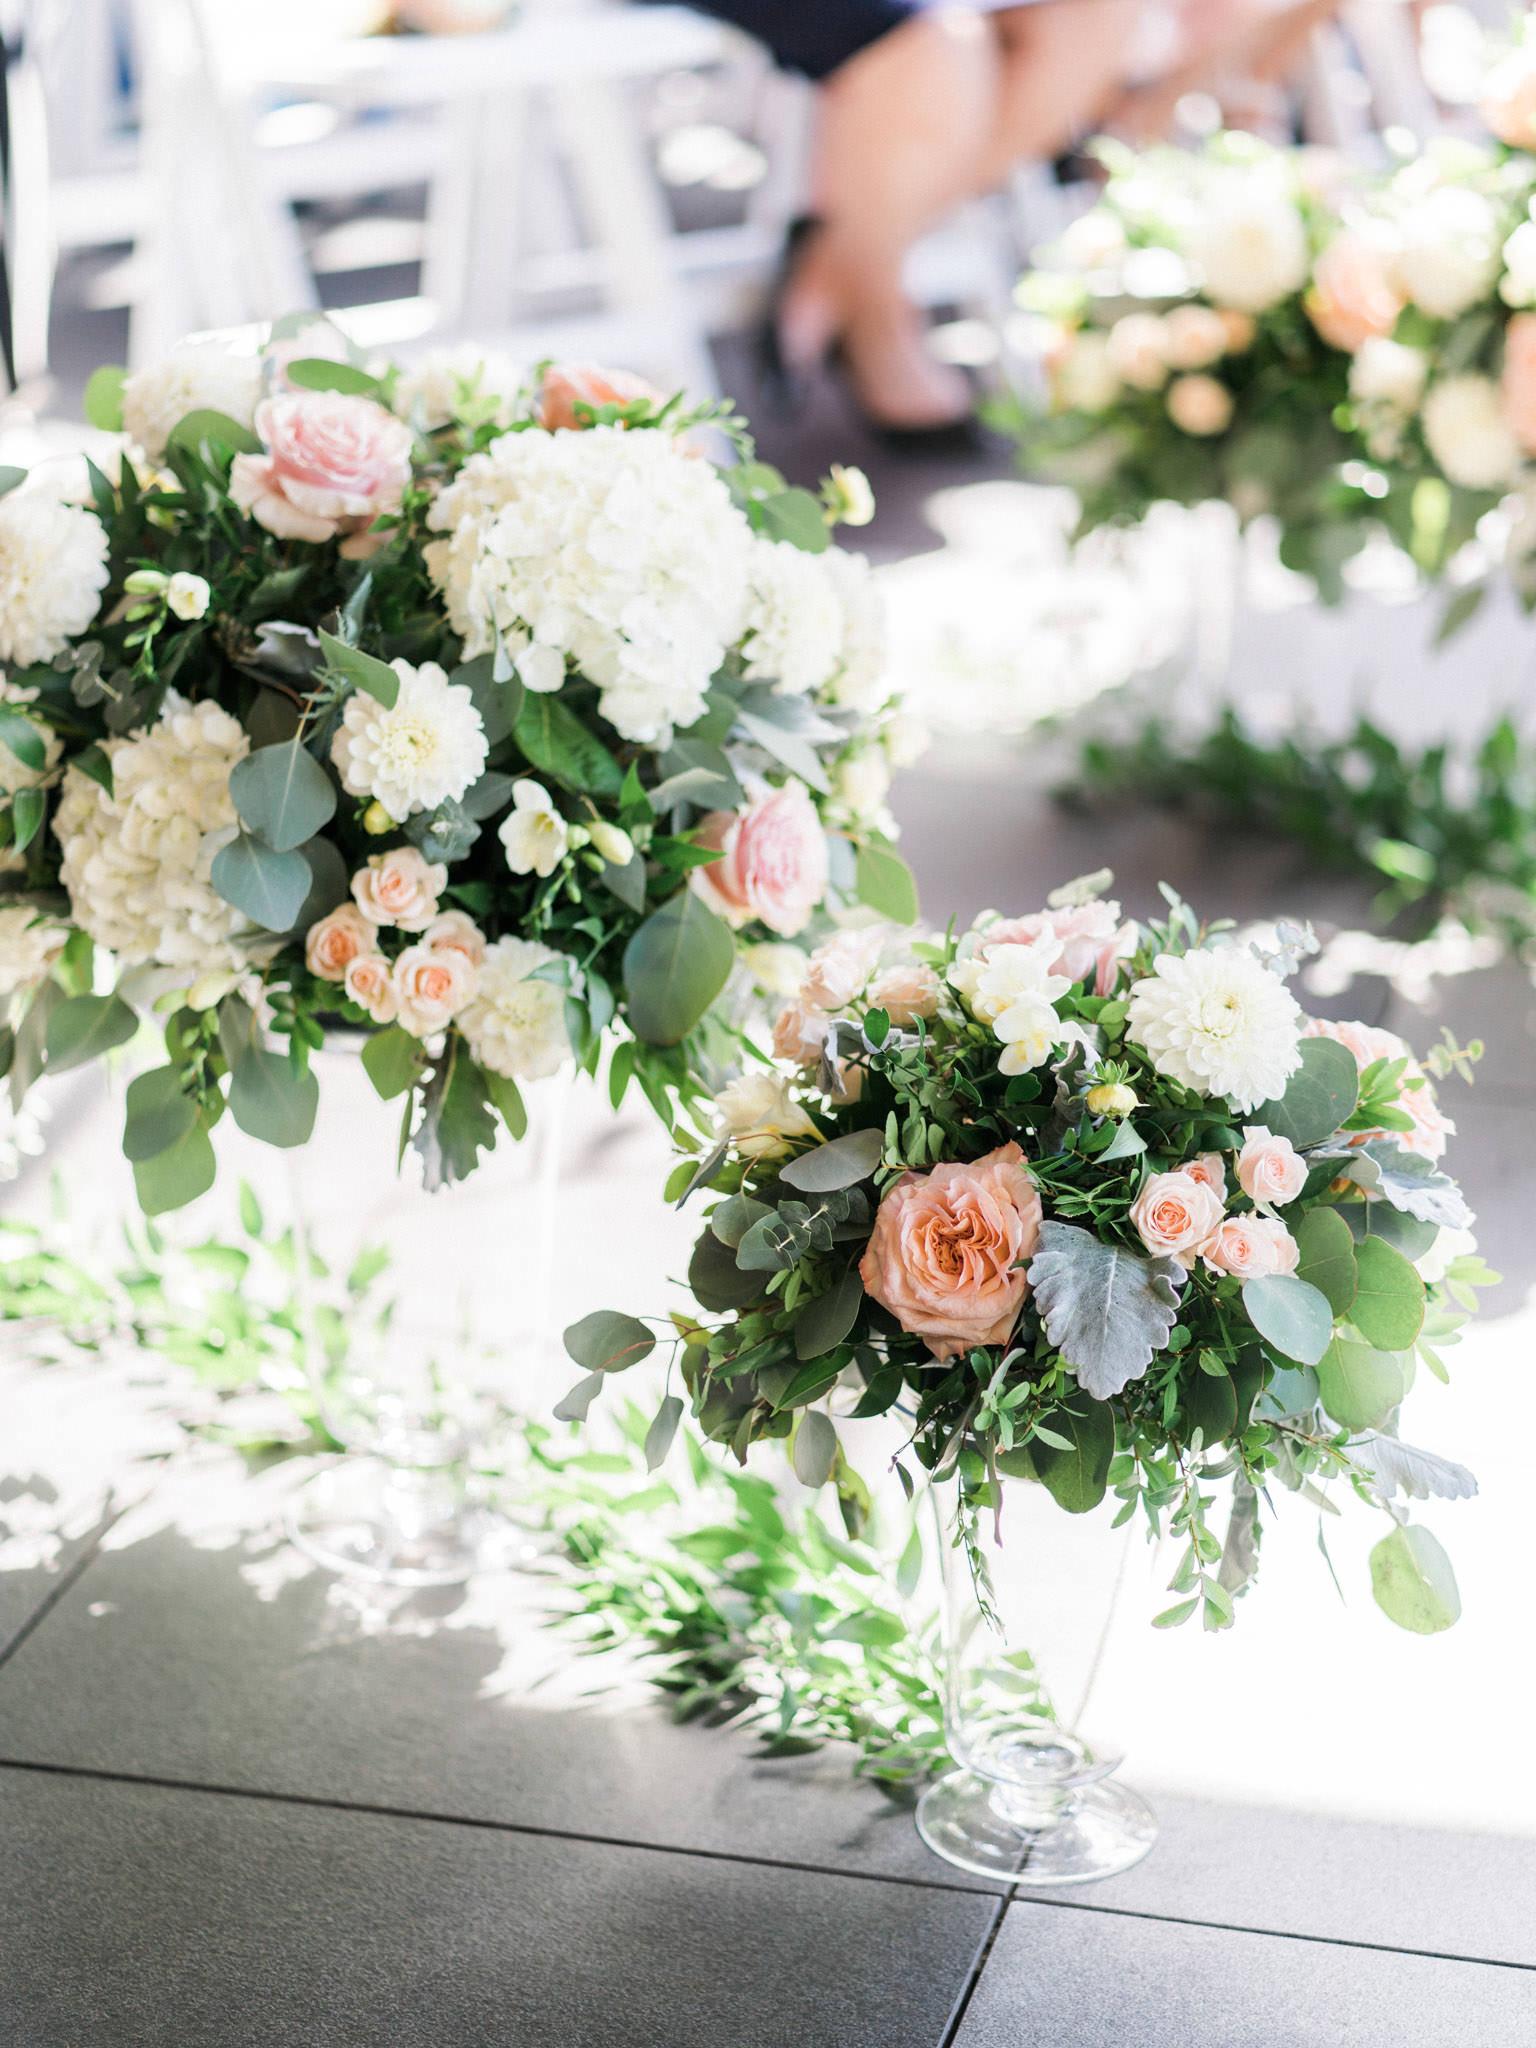 Thomas Hobbs wedding flowers